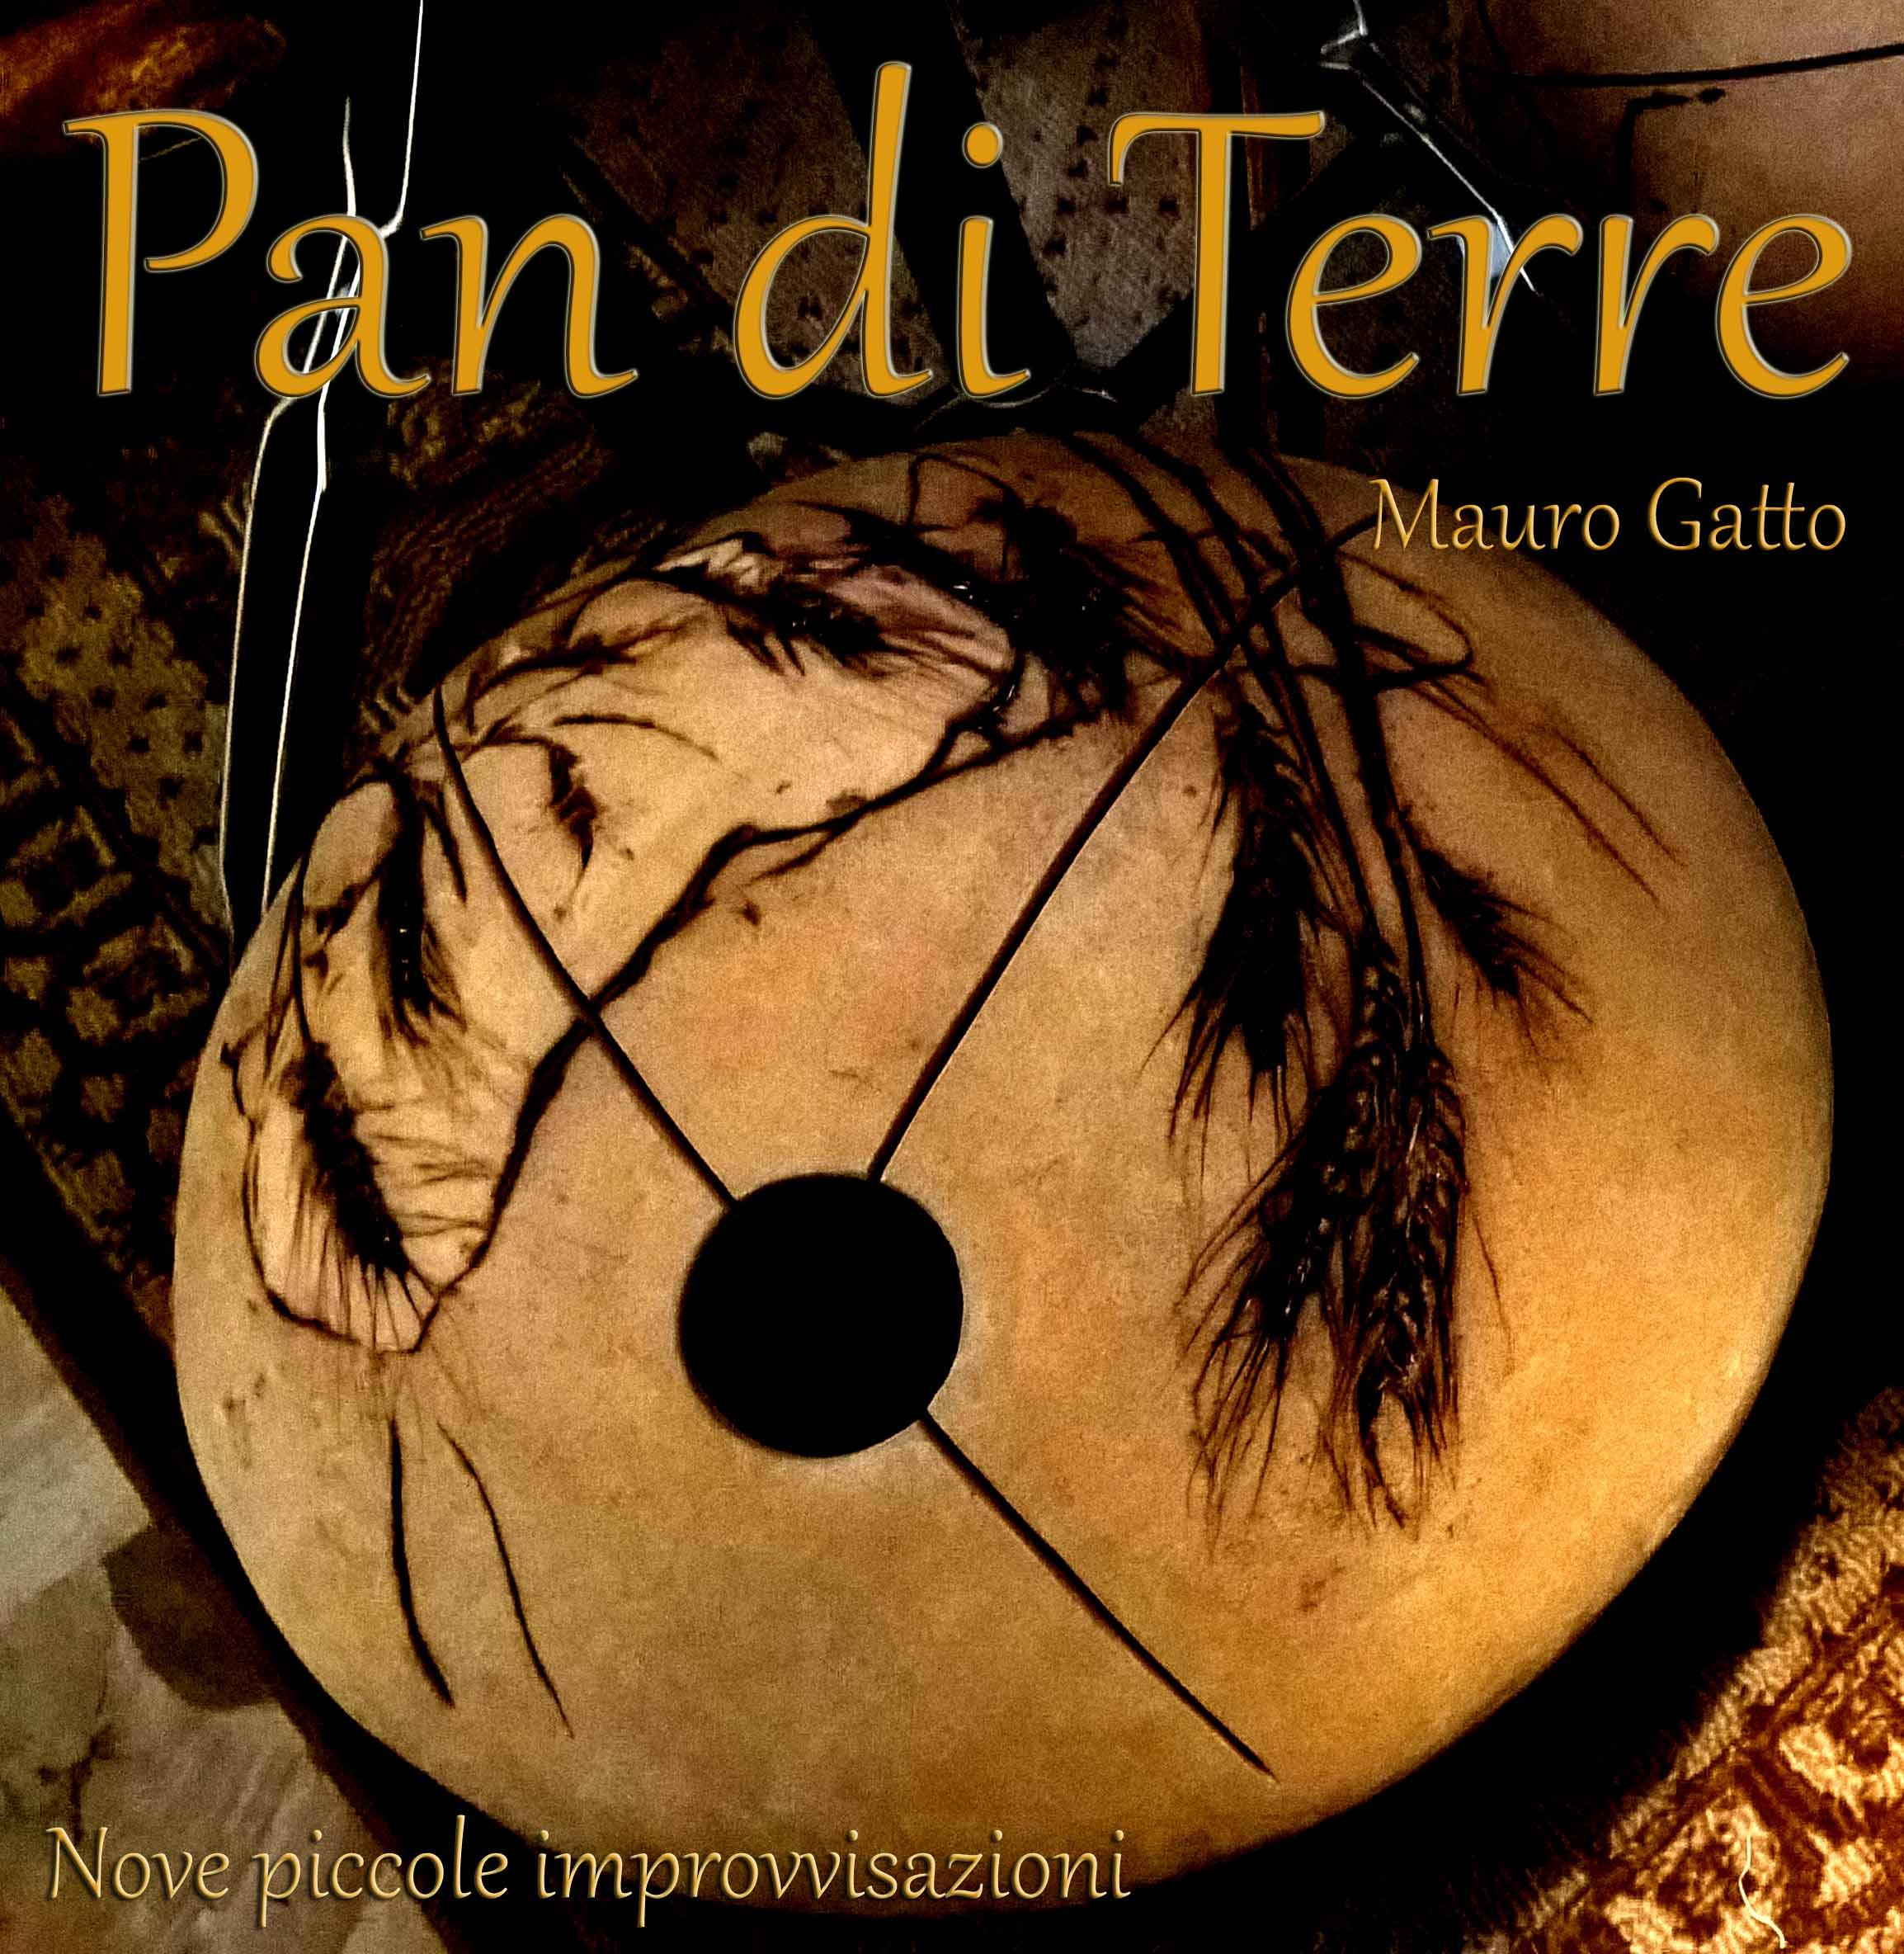 copertina cd web front